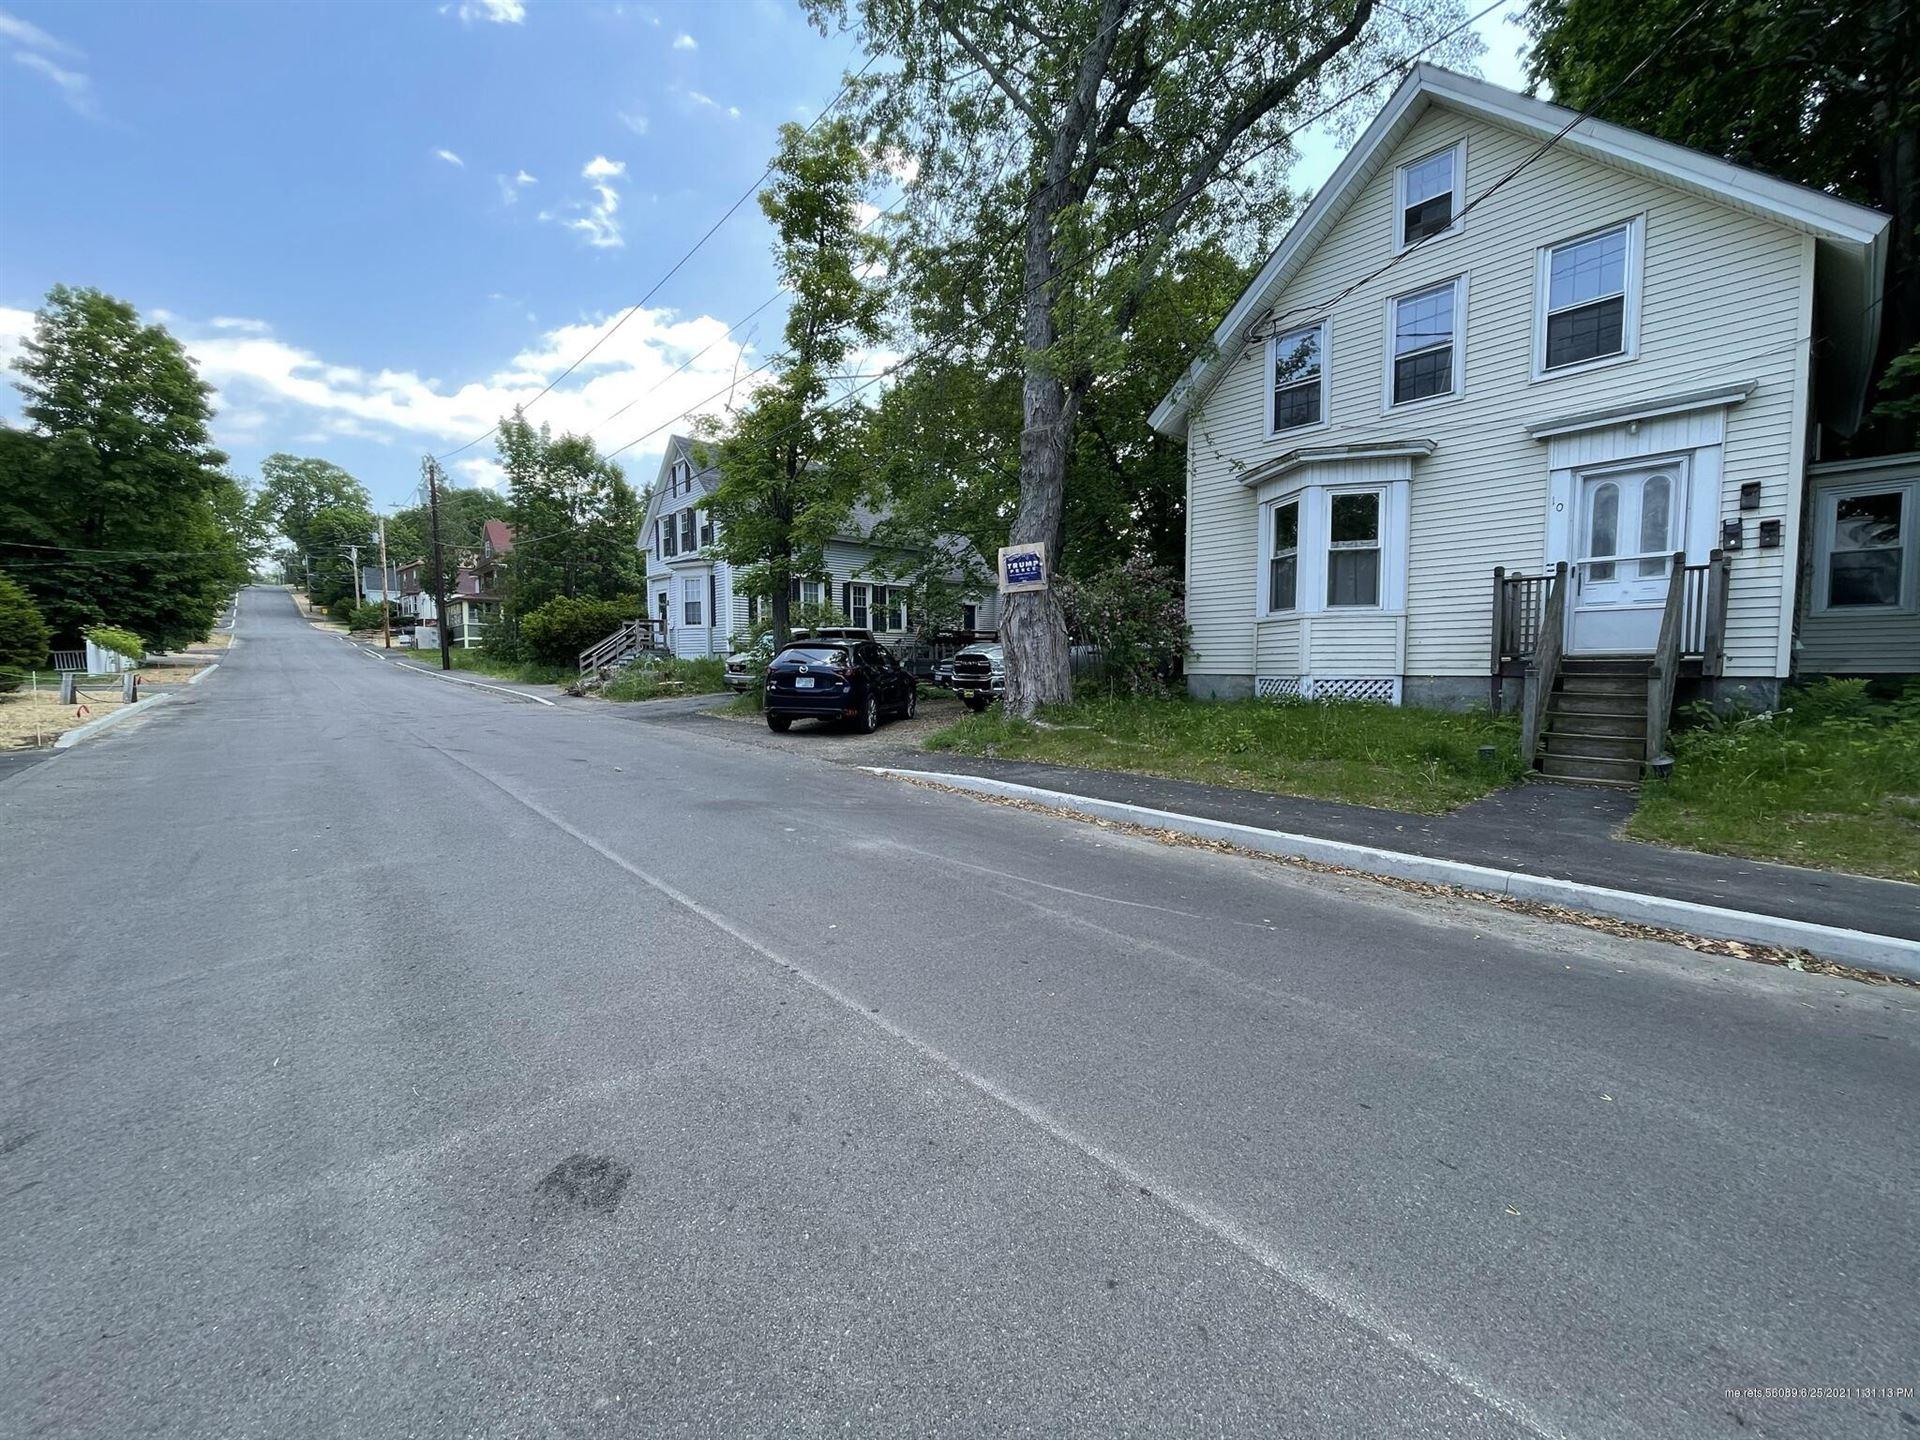 Photo of 10 Murray Street, Augusta, ME 04330 (MLS # 1497078)